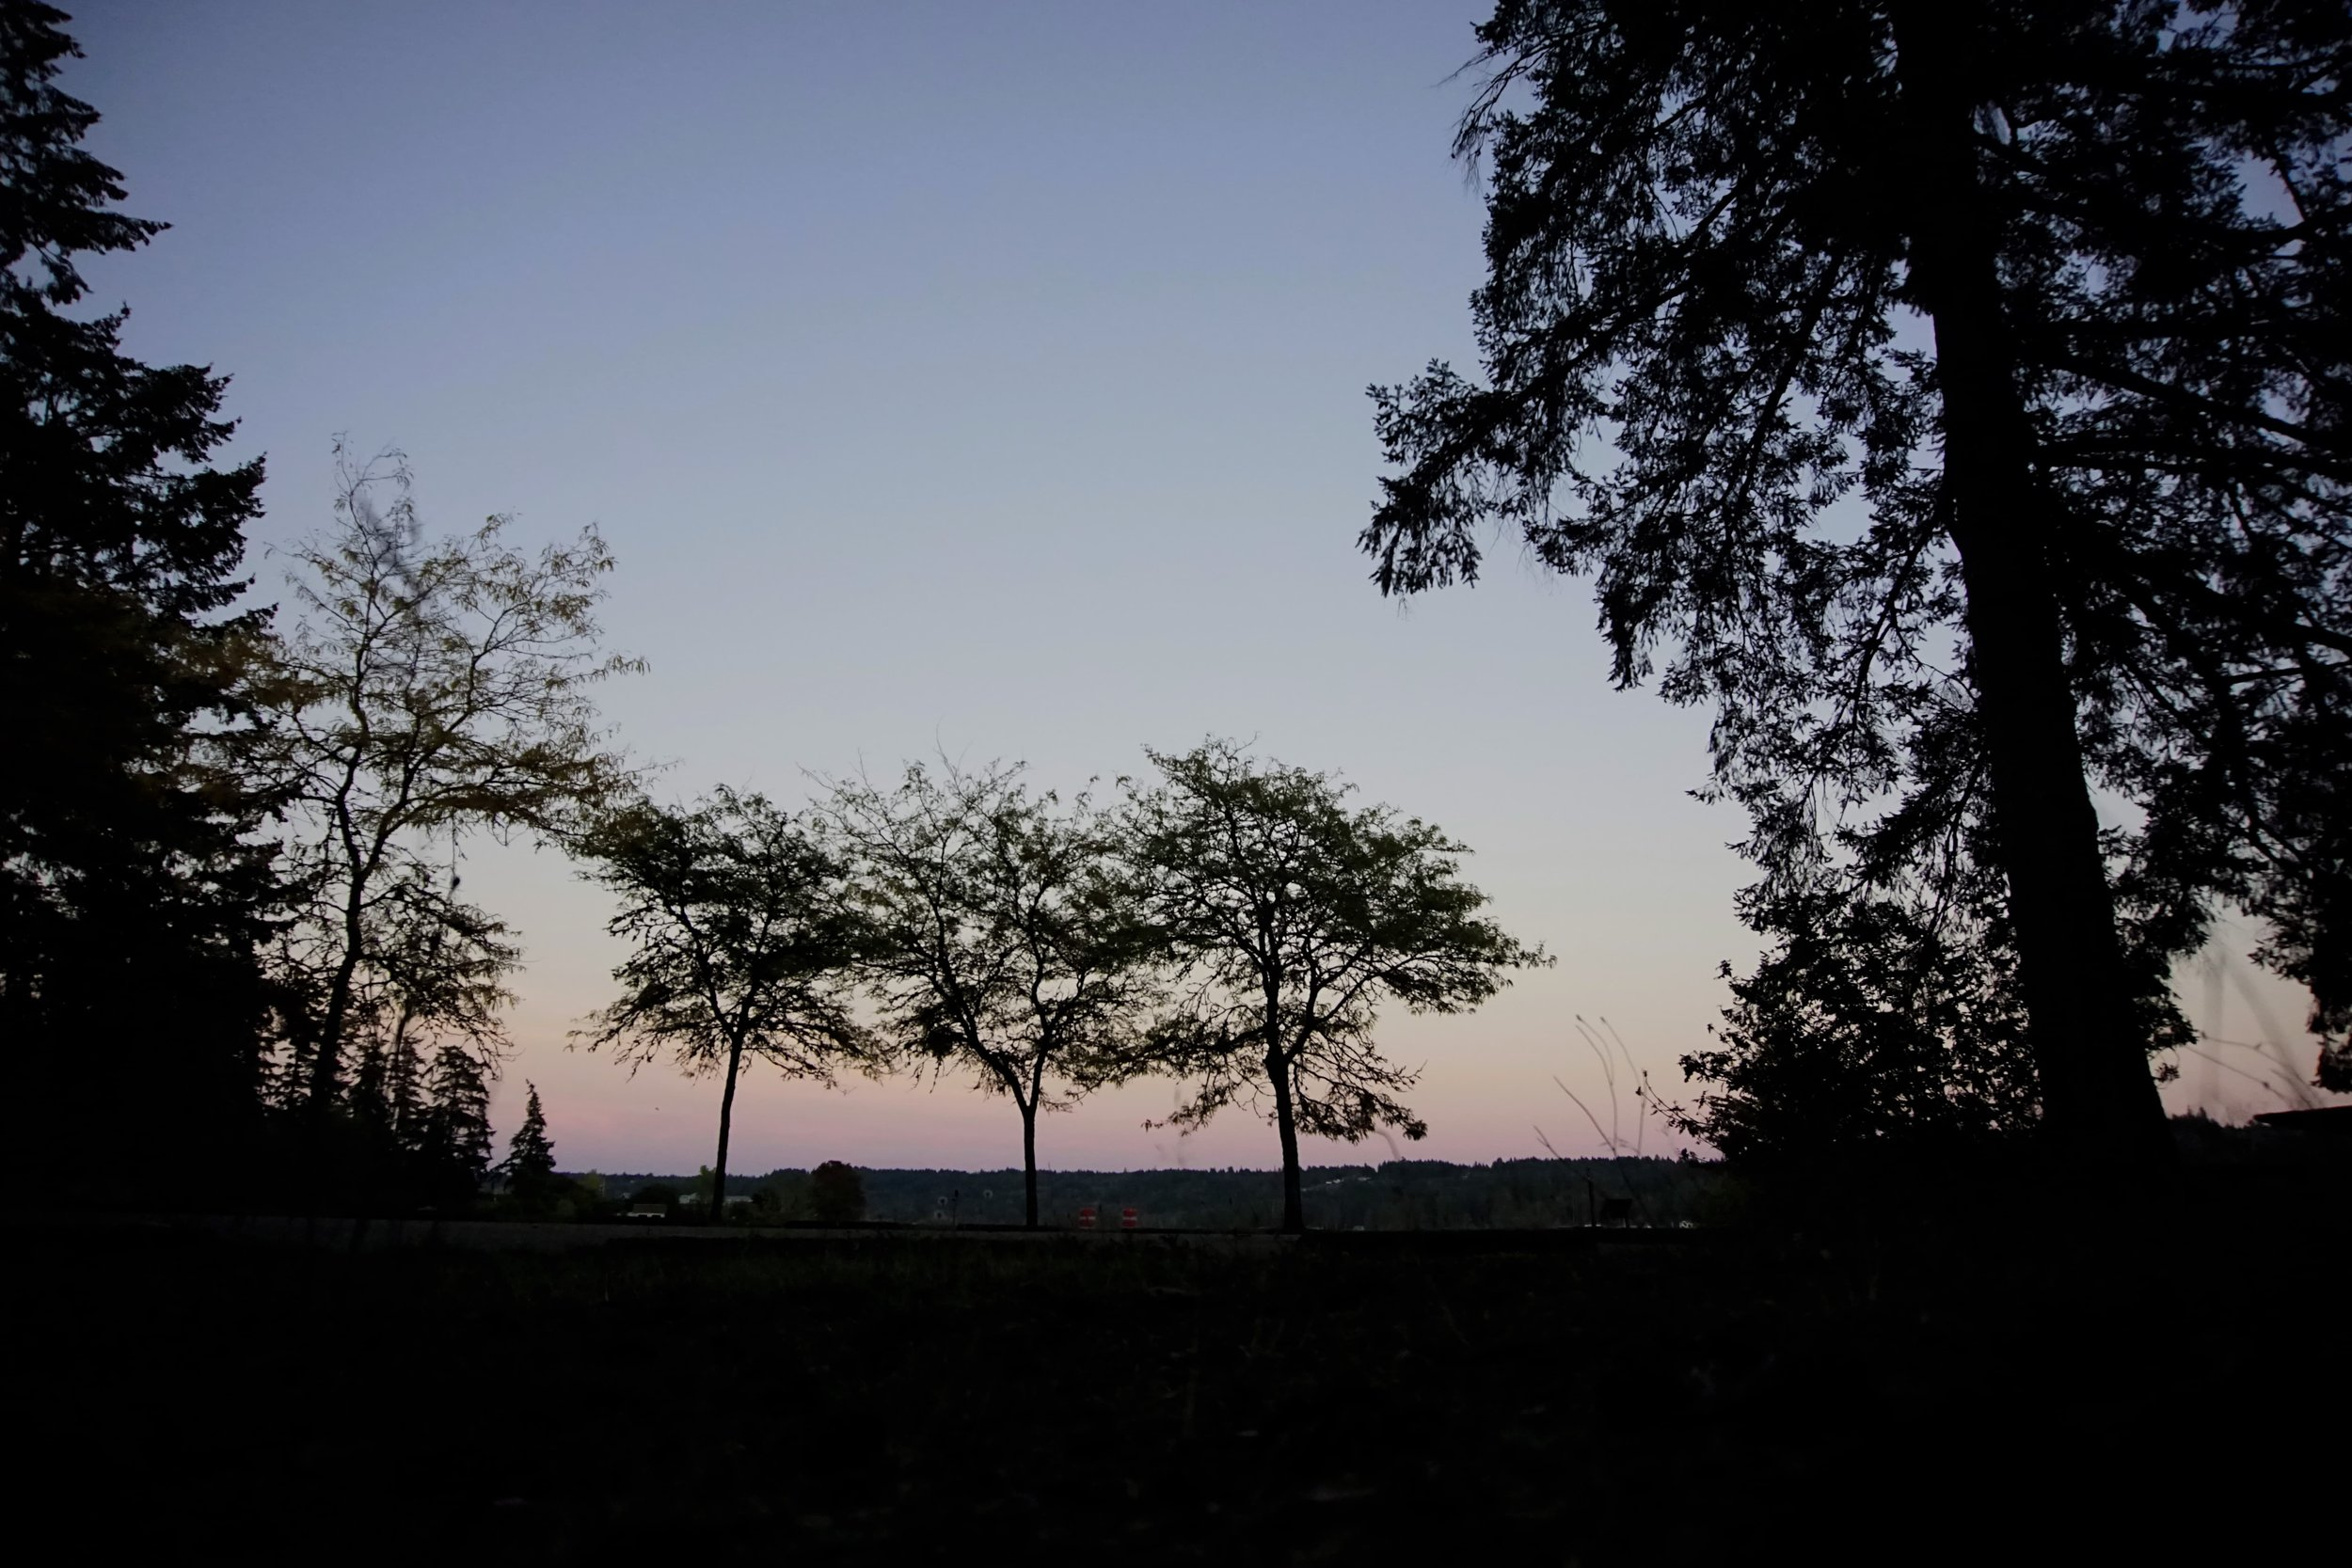 Dusk at Belfair State Park